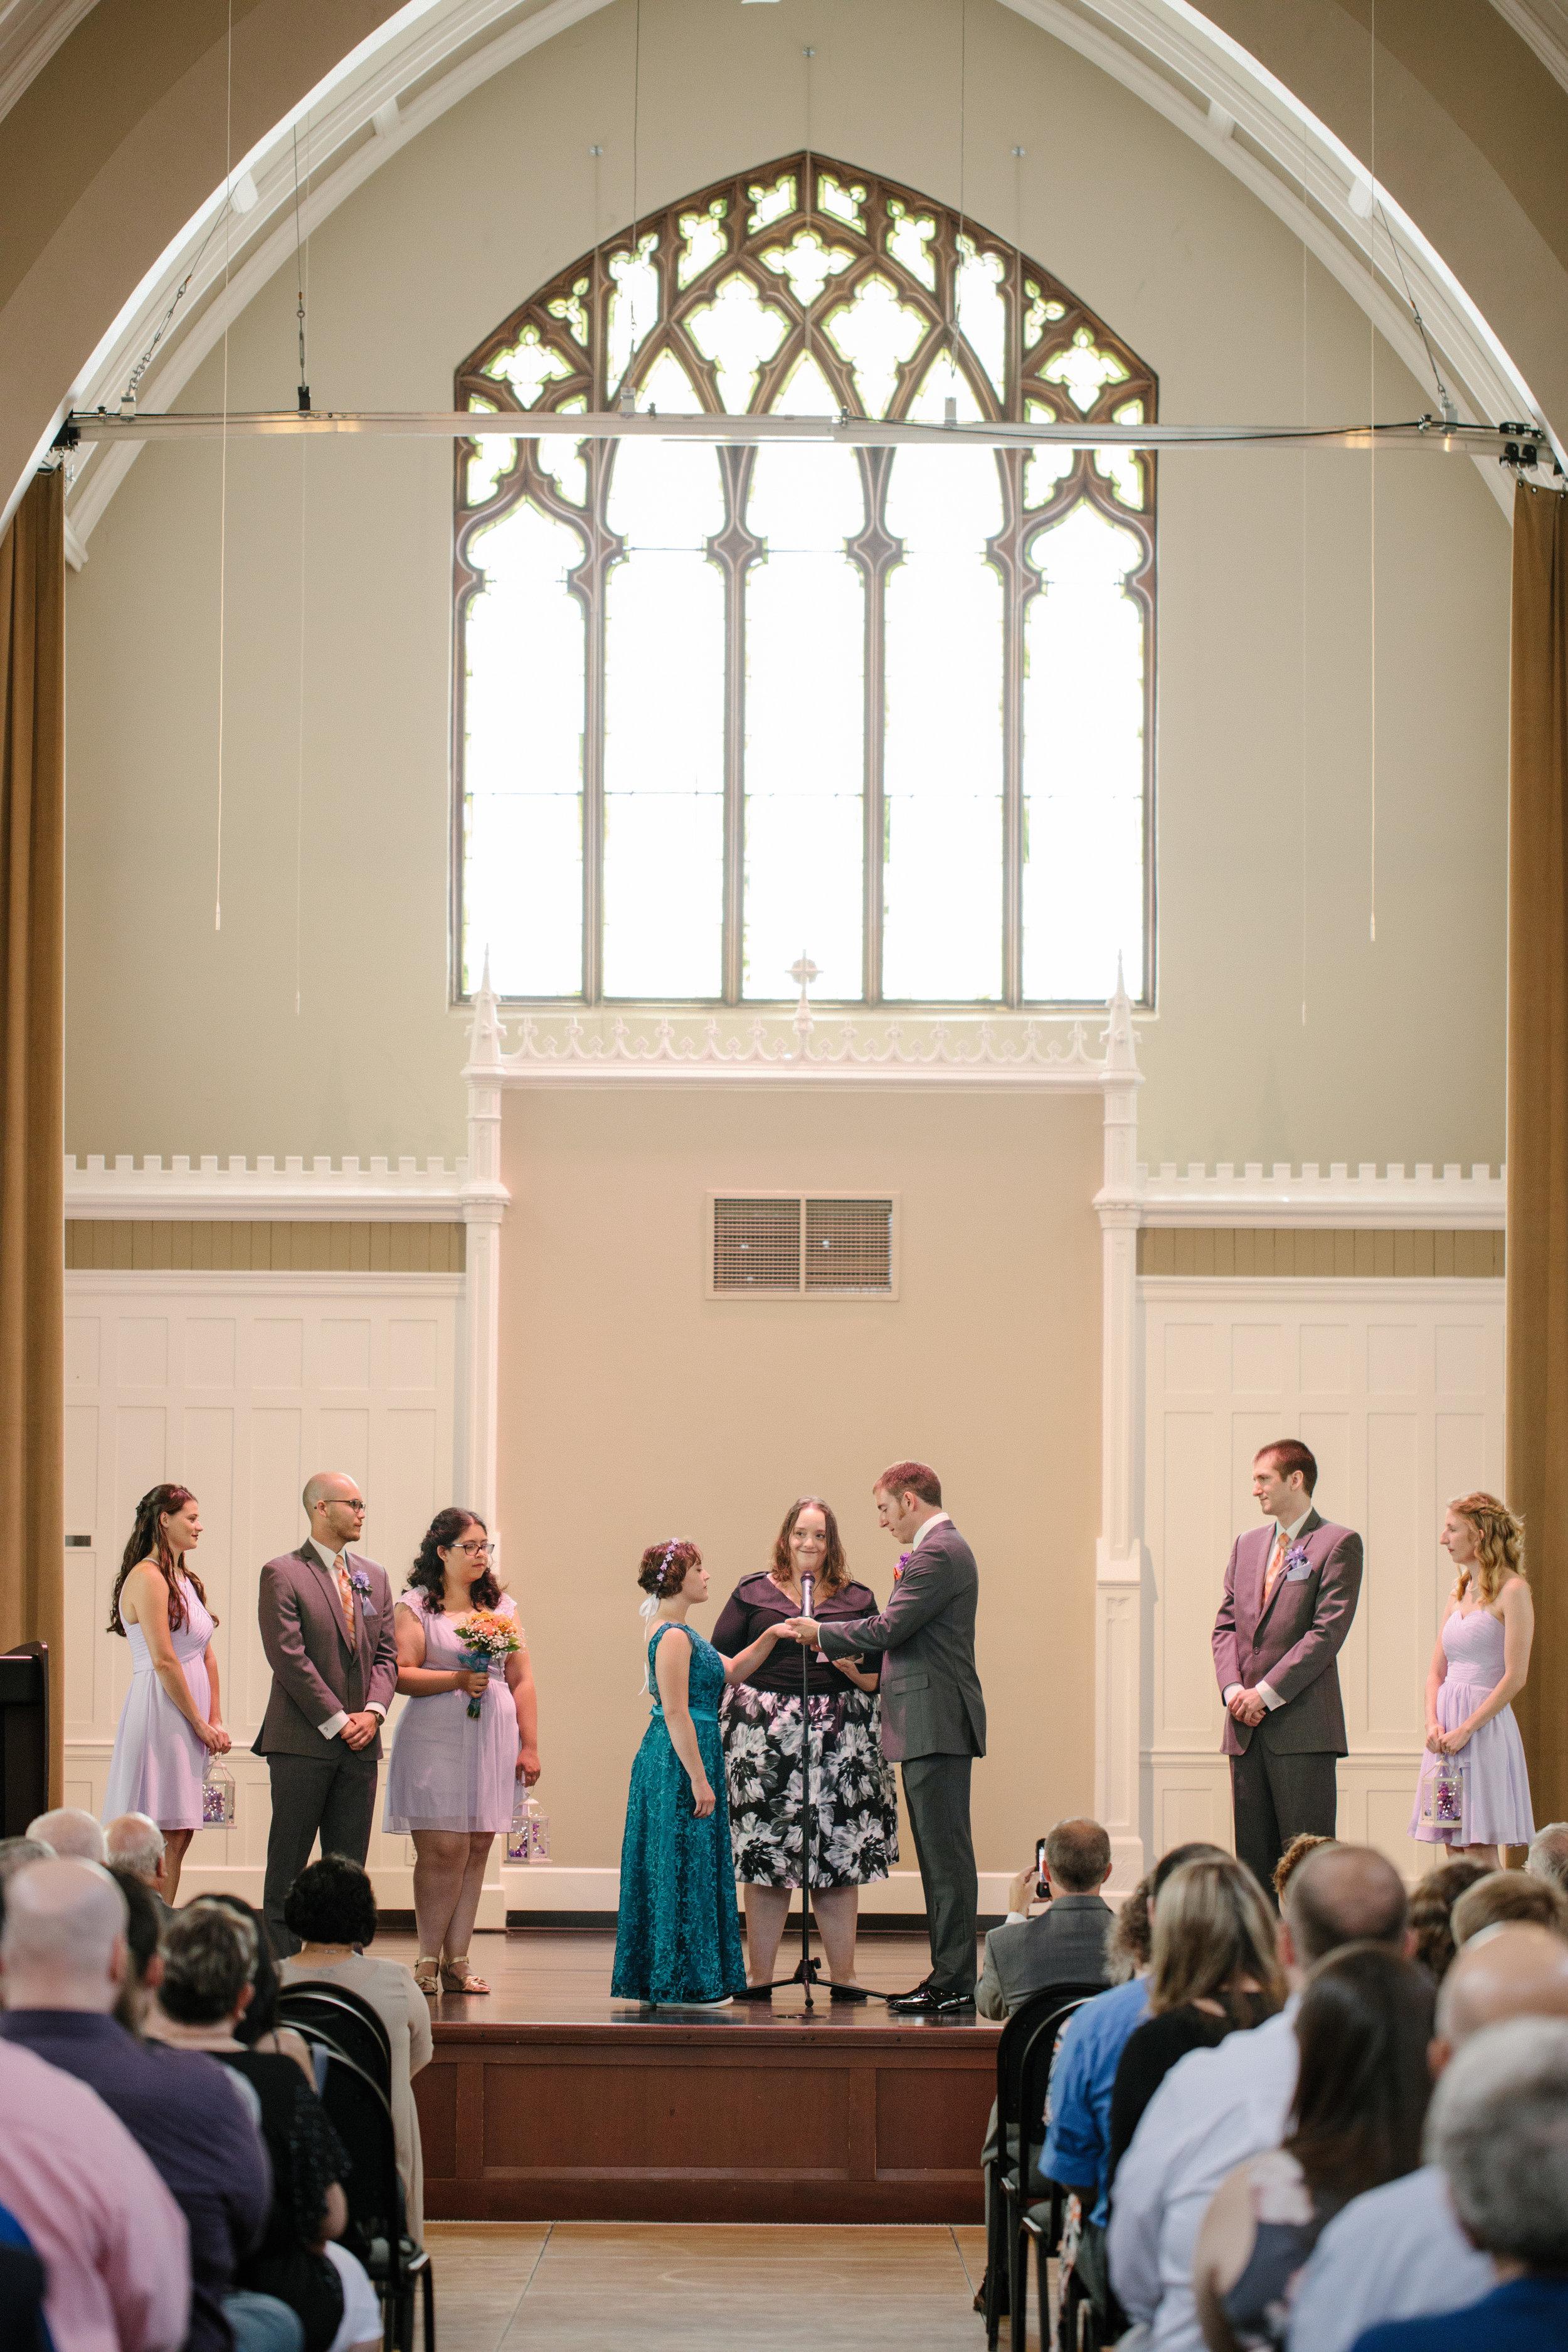 wedding ceremony in rosemount steeple center Minneapolis Minnesota wedding venues